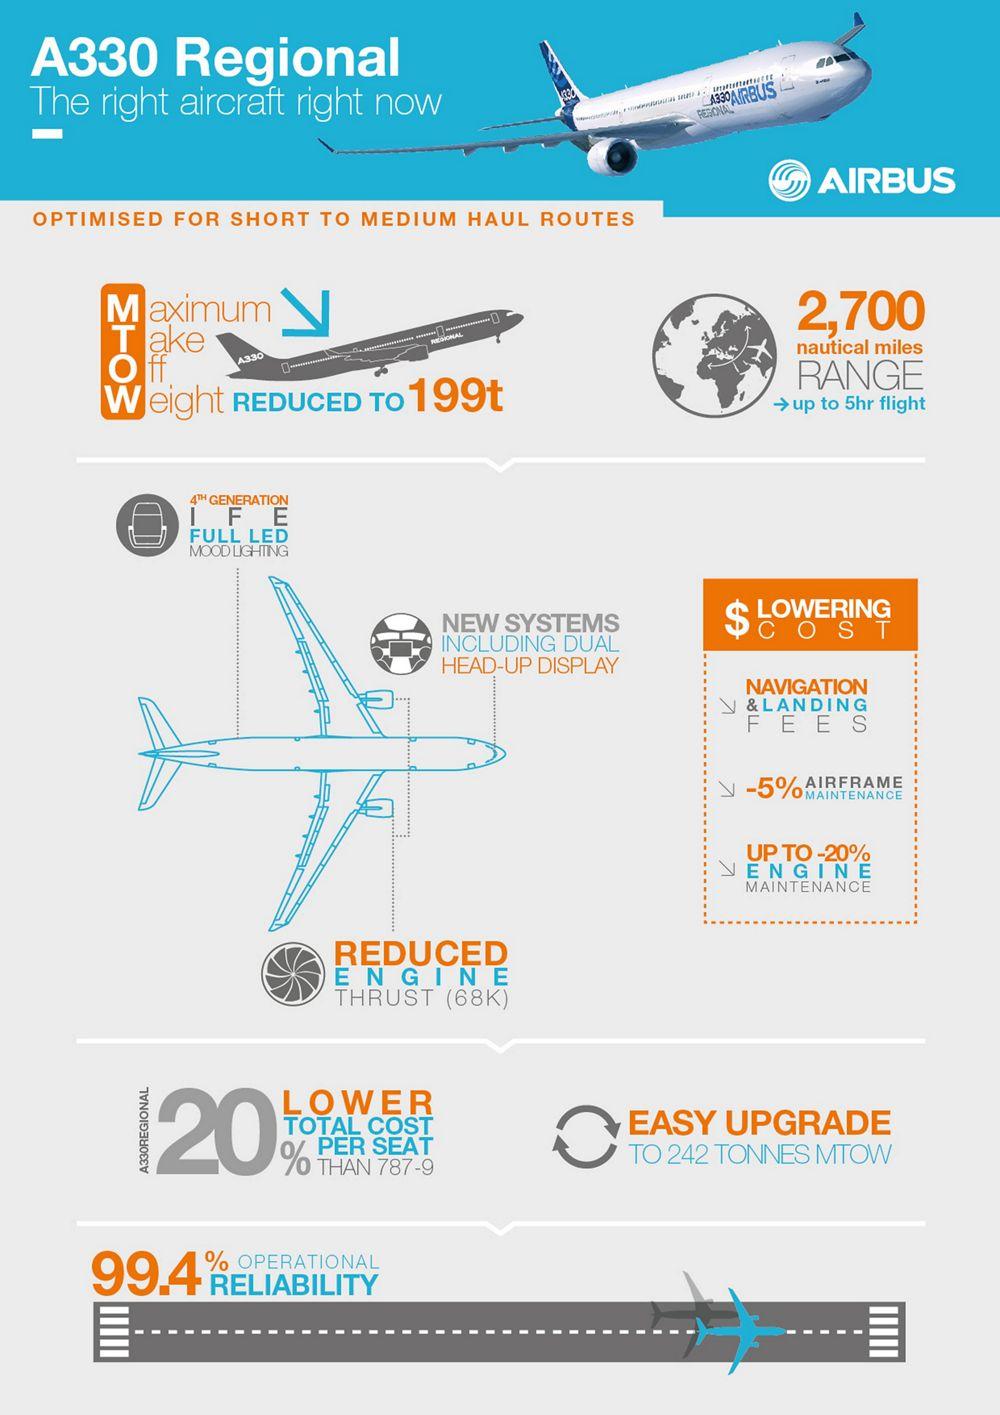 A330Regional, A330 Regional_infographic